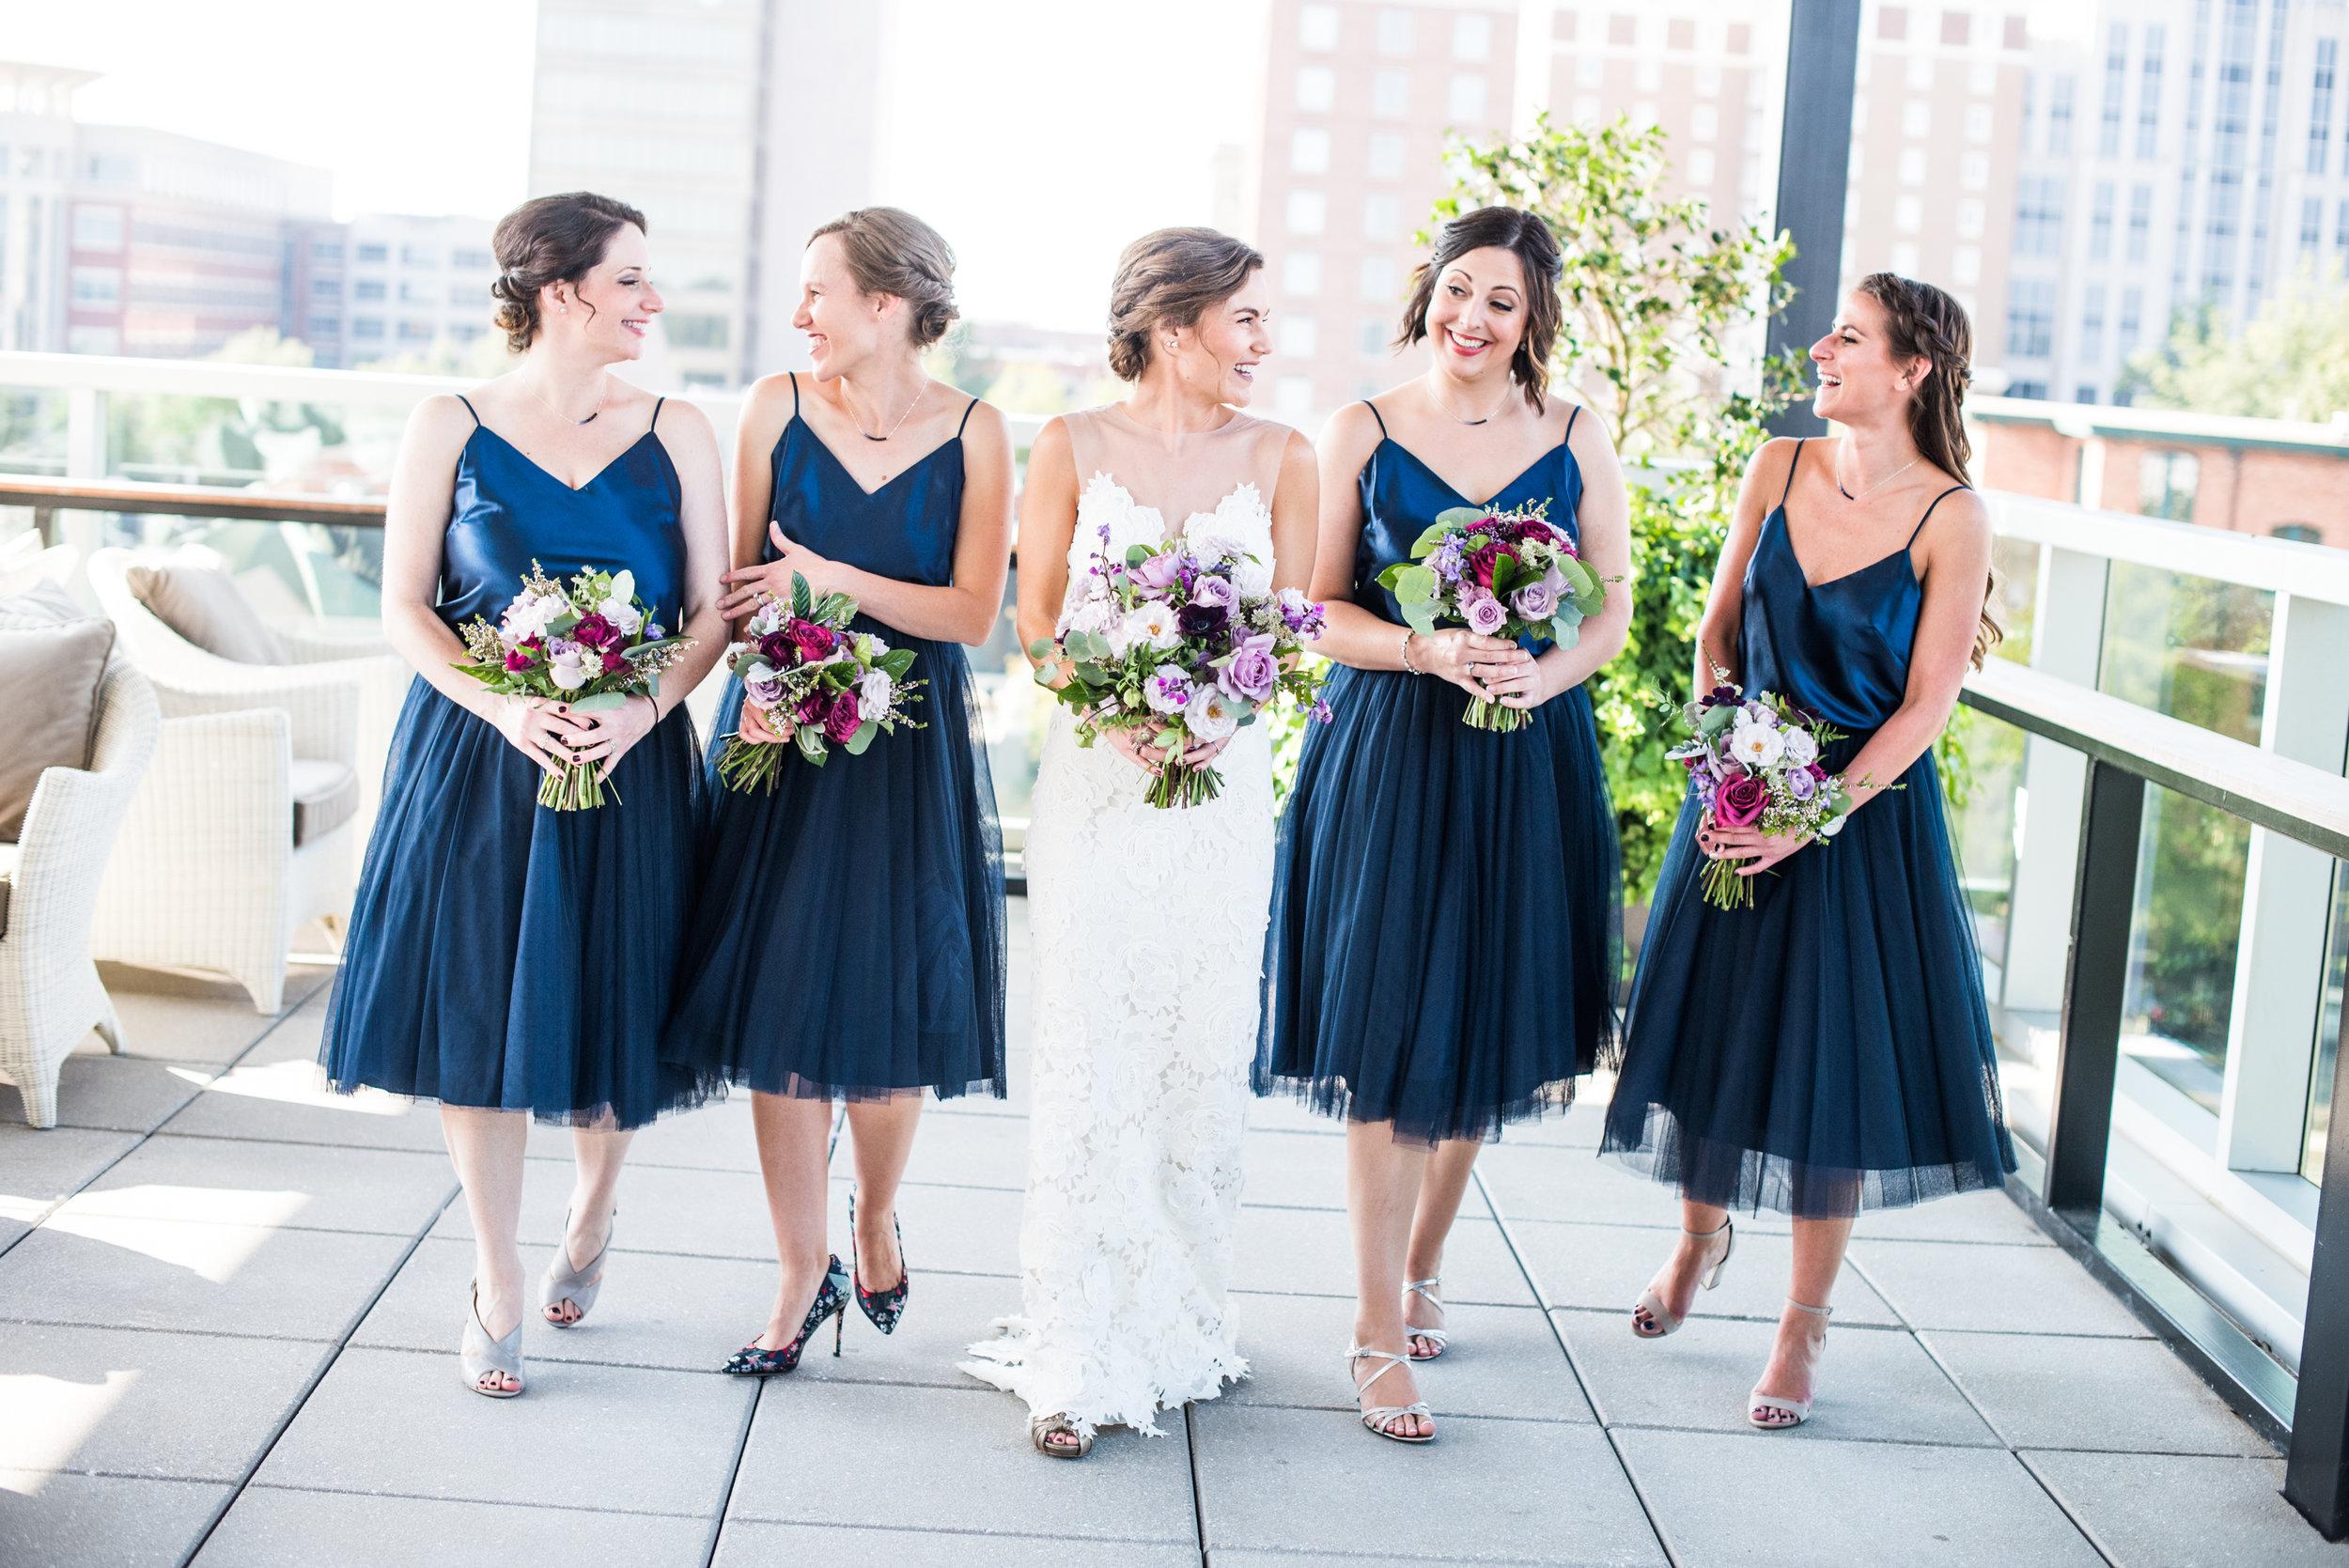 Lauren + Chris: Polished Modern Wedding in Downtown Greenville | Palmetto State Weddings